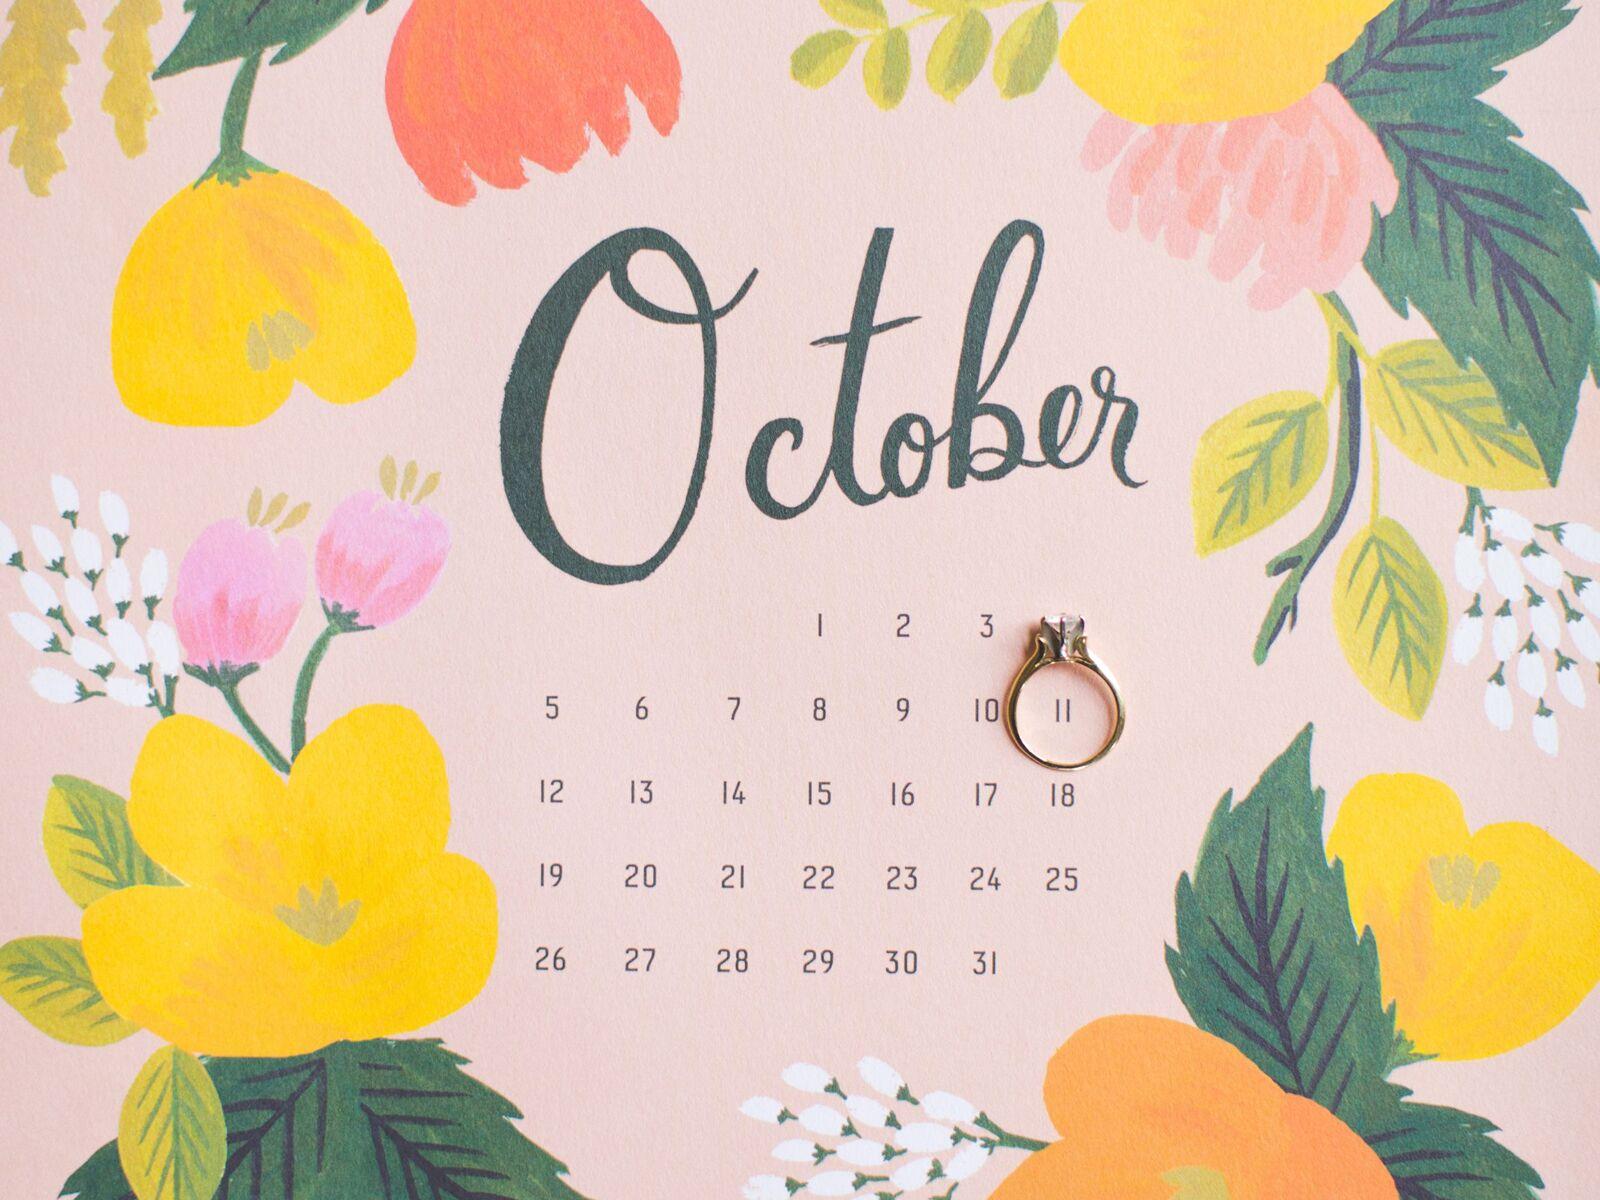 September 2022 Calendar Wallpaper.Wedding Dates To Avoid In 2021 2022 And 2023